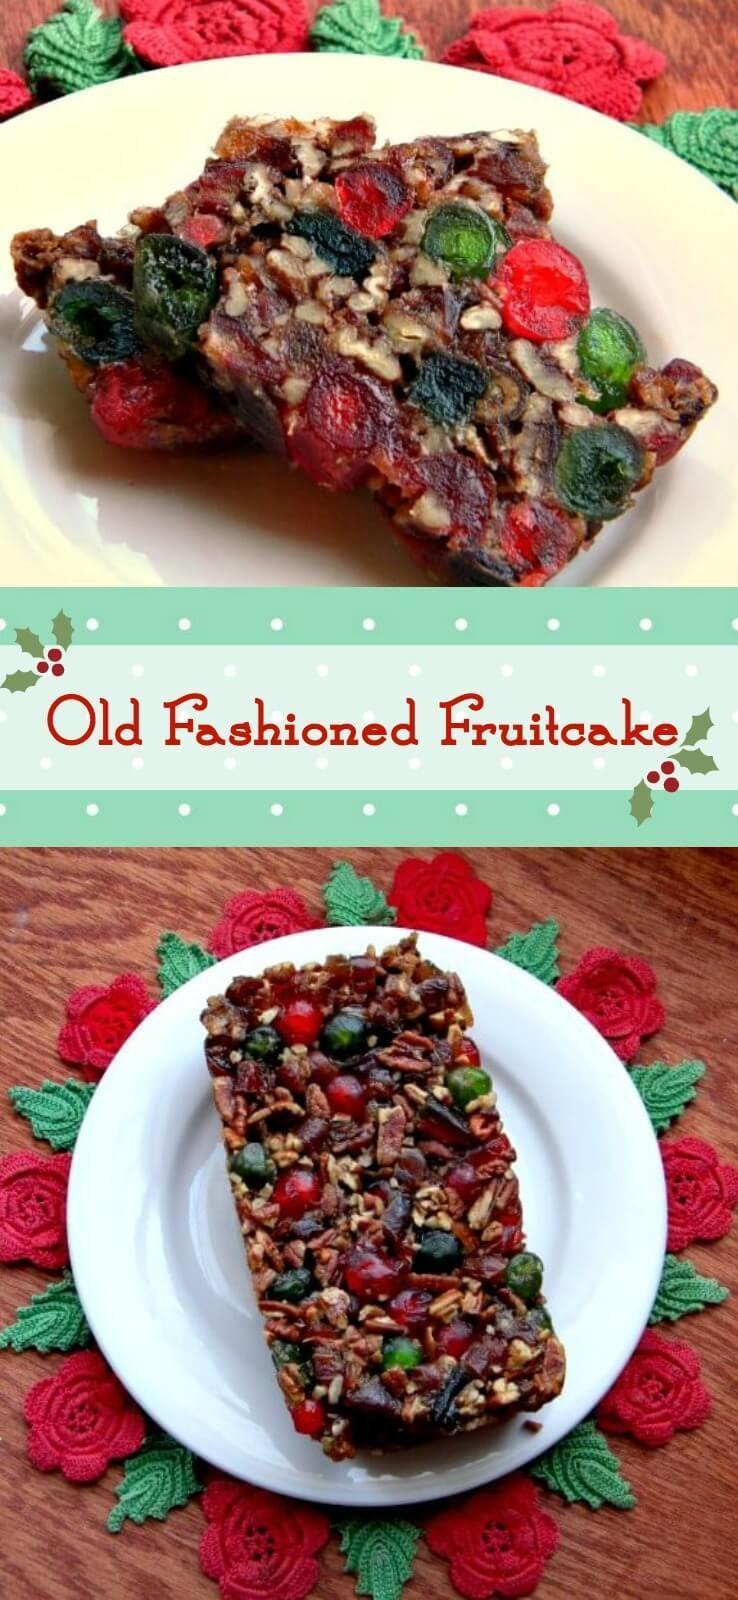 Fruit Cake Recipe Best In The World Recipe Fruitcake Recipes Fruit Cake Christmas Recipes